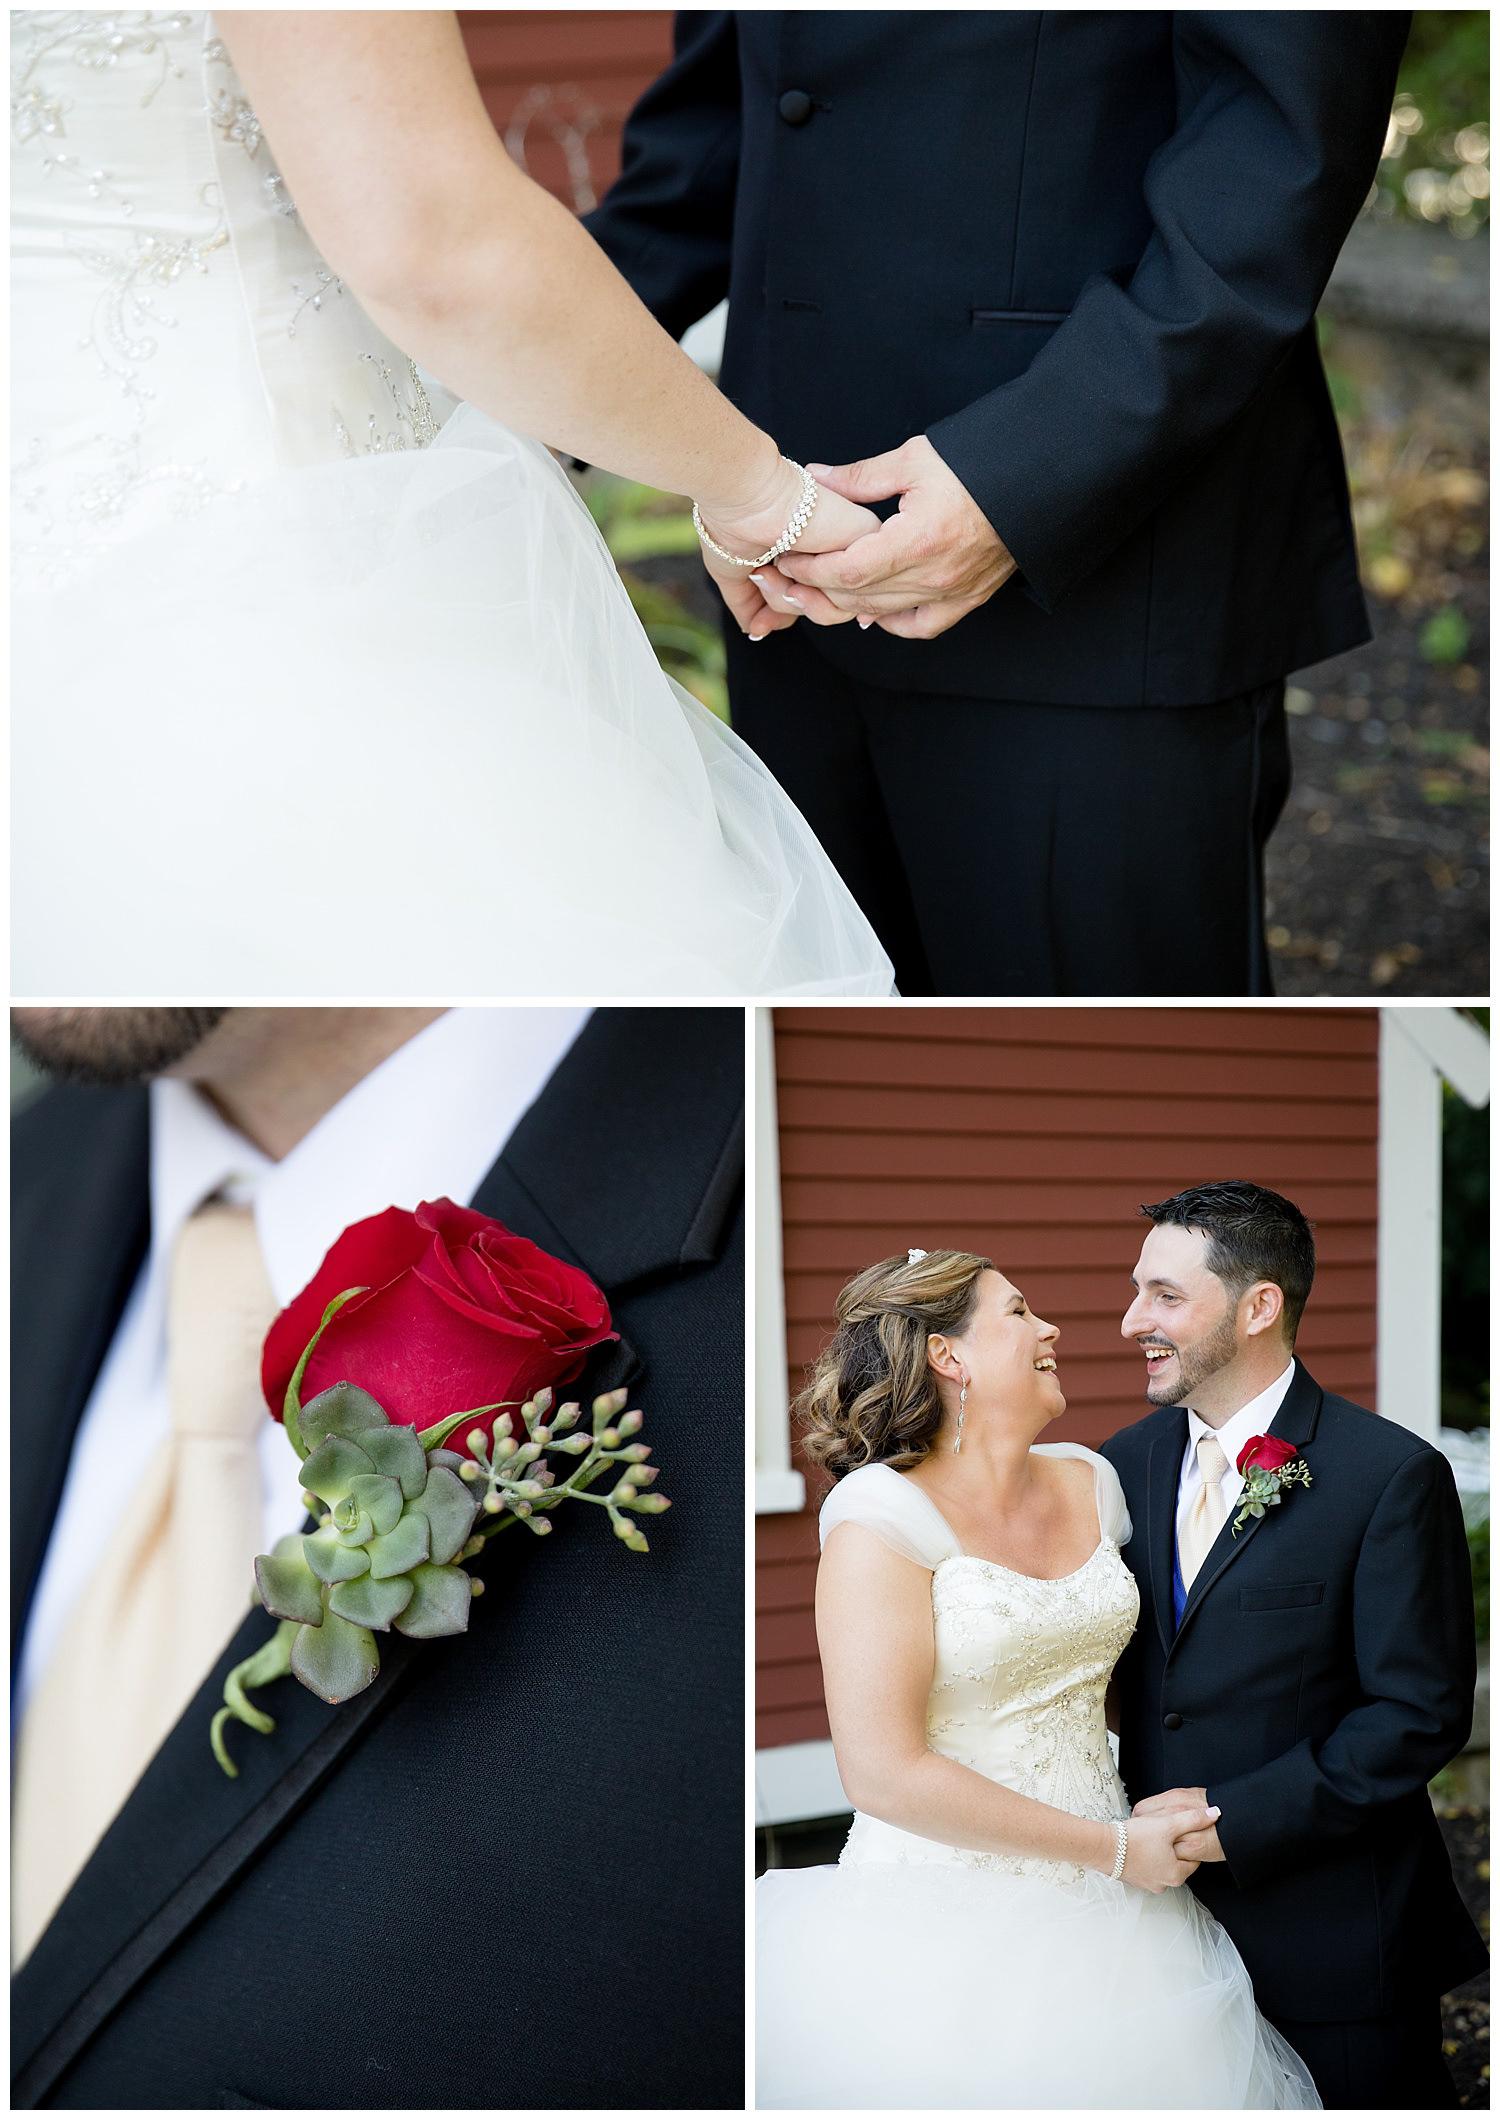 smith-barn-brooksby-farm-wedding-26-north-studios-boston-wedding-photographer-014.jpg